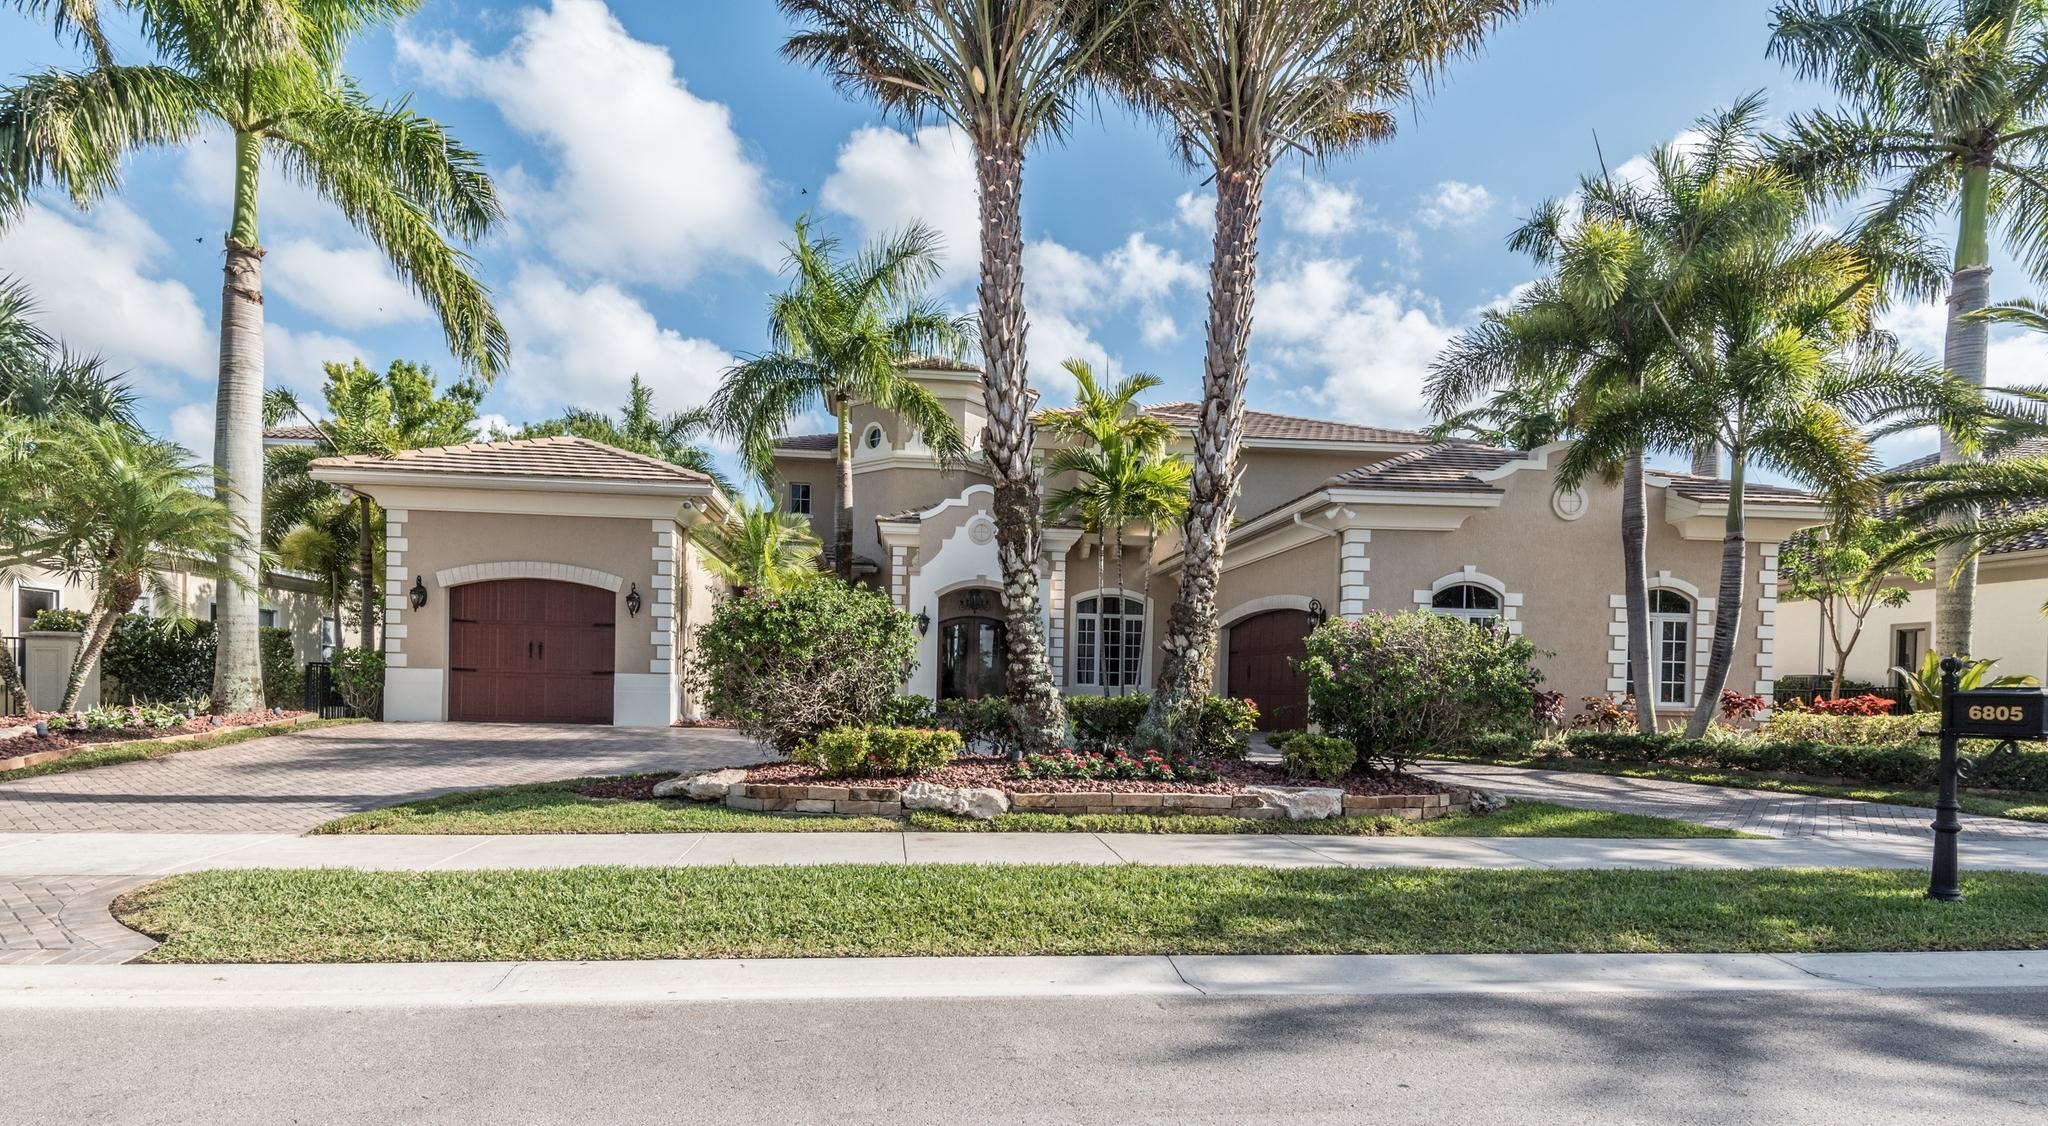 Photo of 6805 NW 122nd Avenue, Parkland, FL 33076